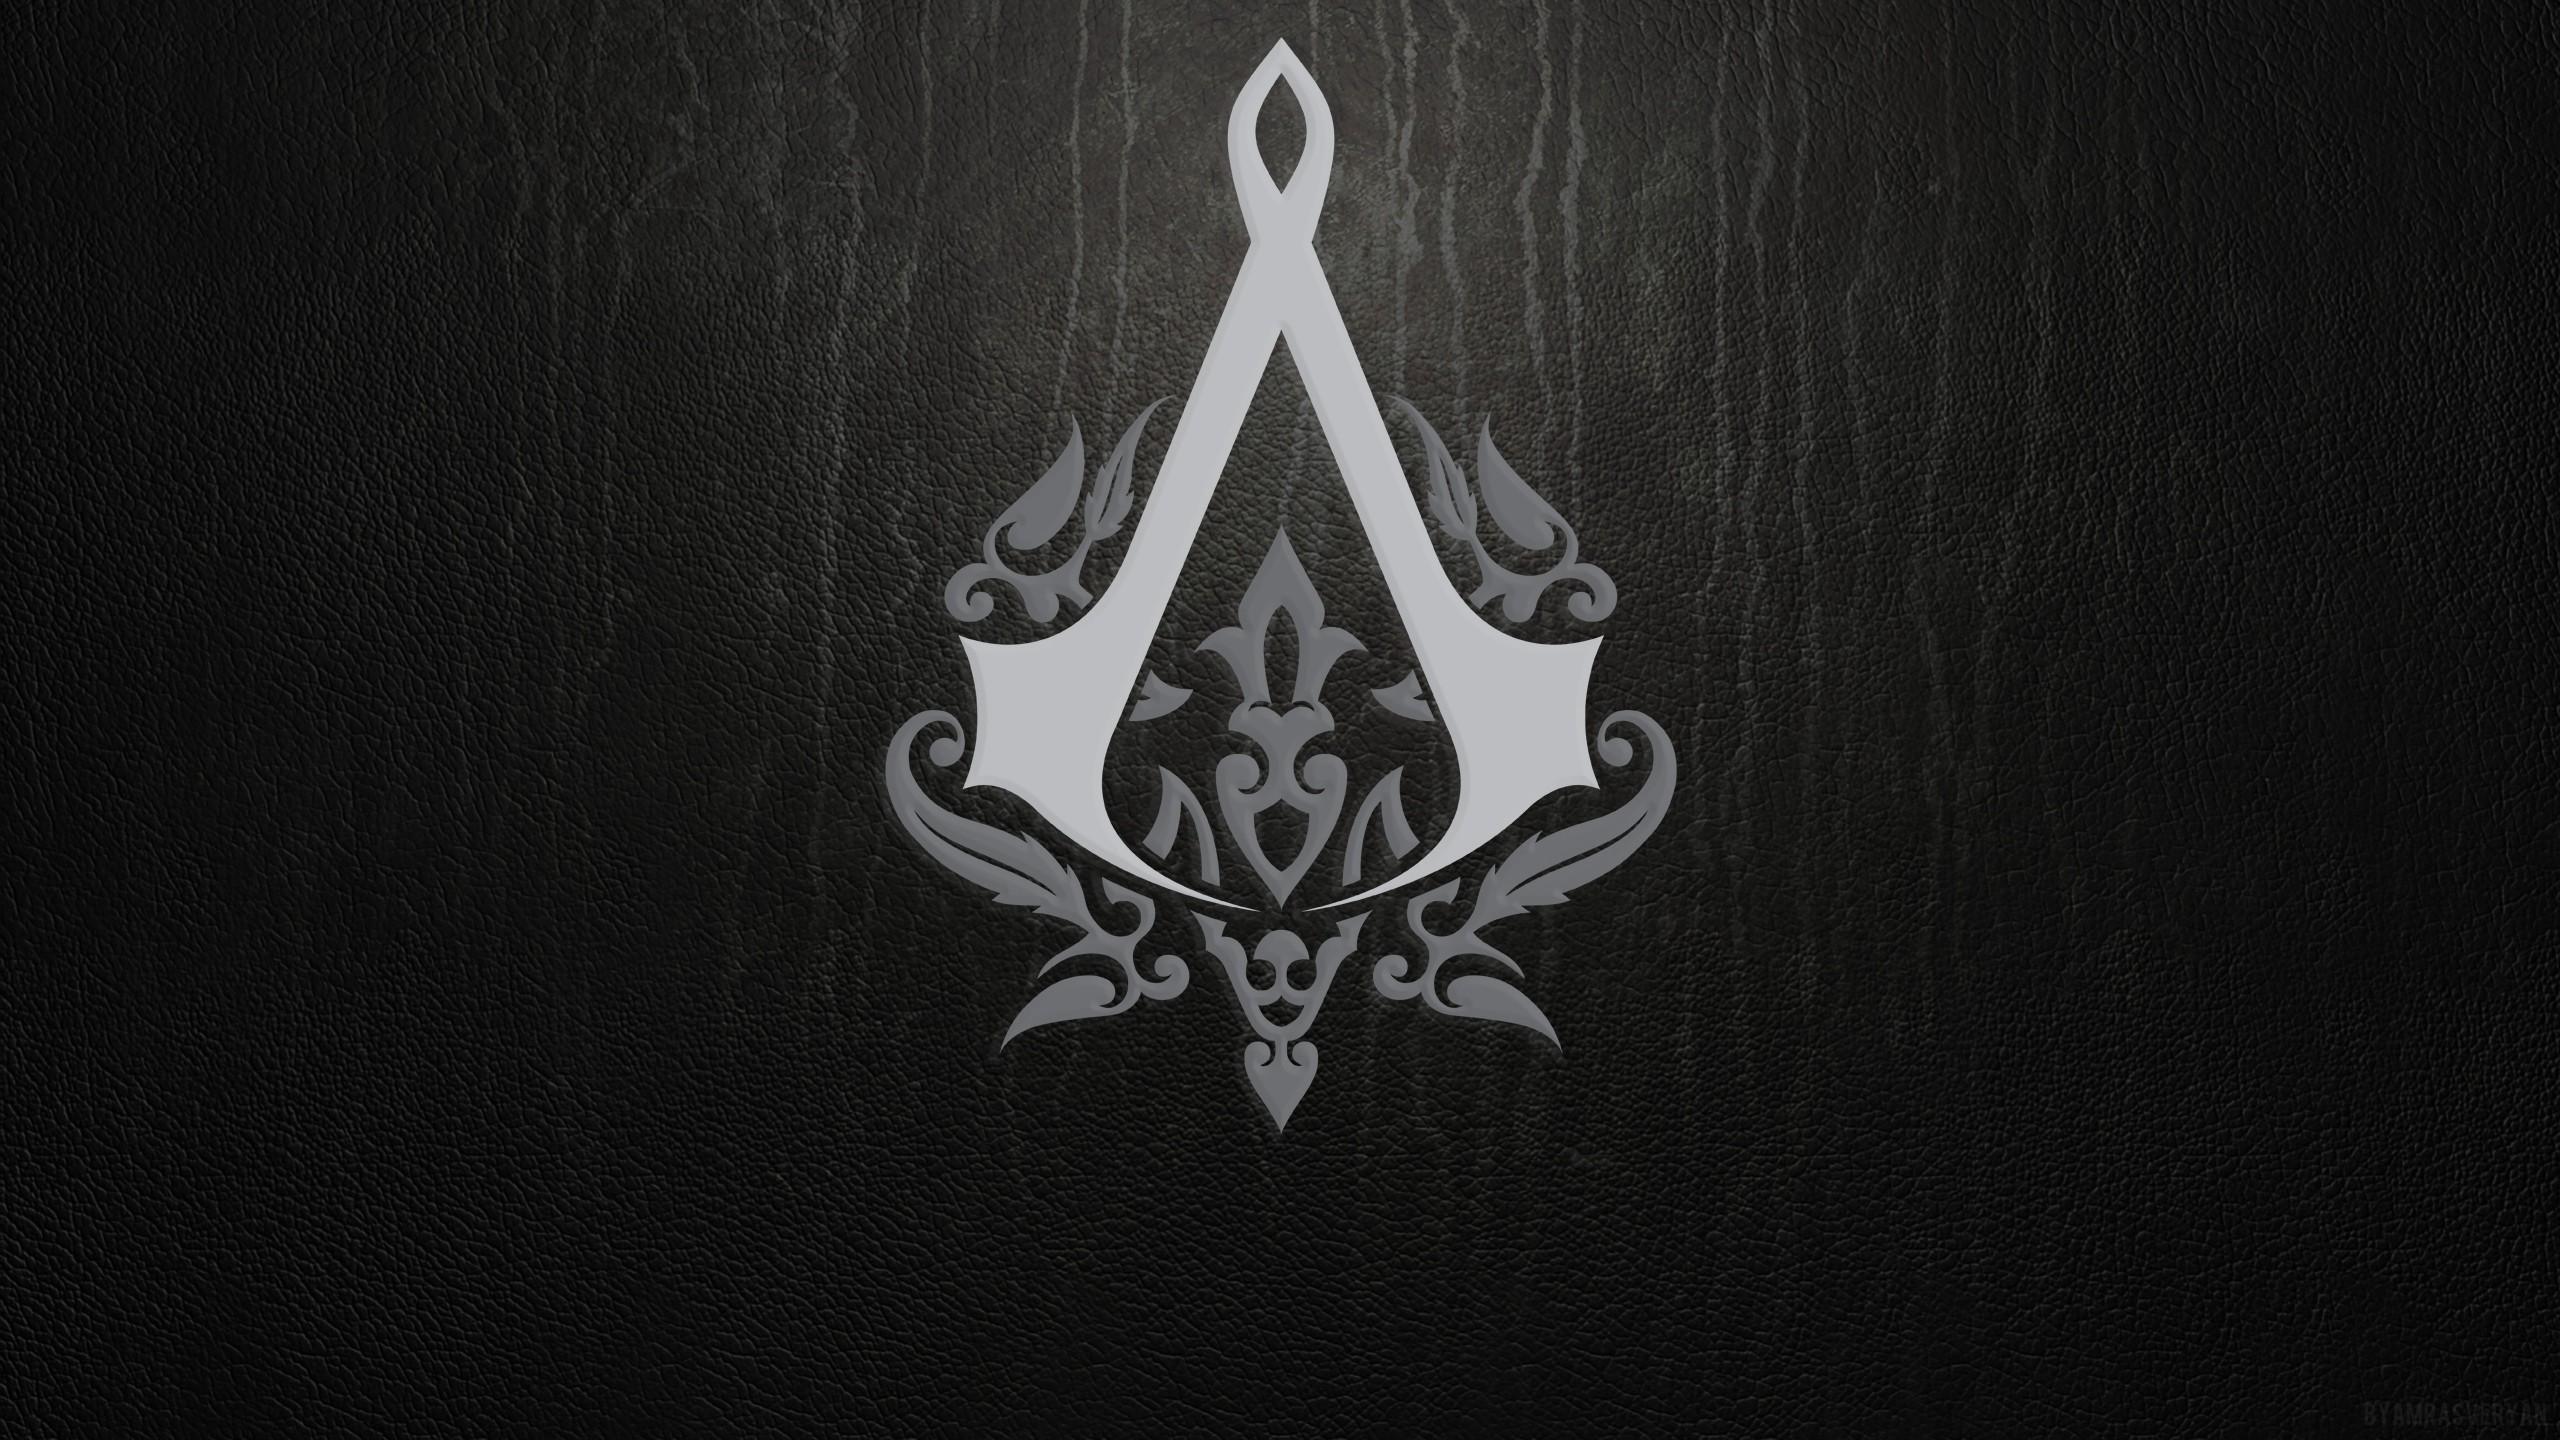 Preview wallpaper assassins creed, emblem, background, sign 2560×1440